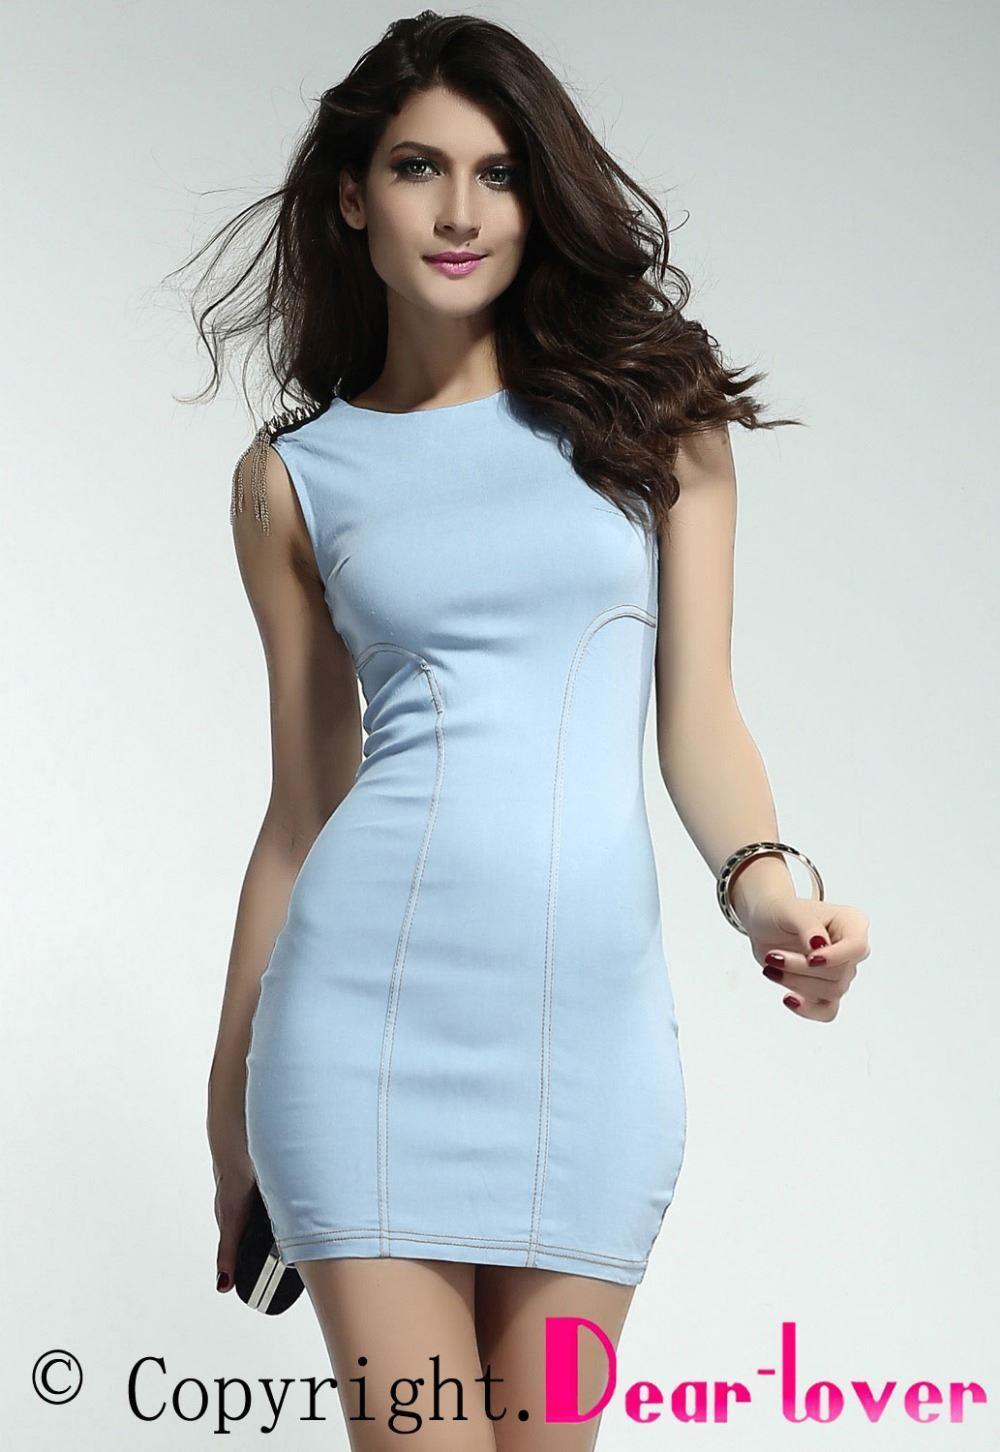 Dear Lover Sexy Stylish Skintight Denim Dress Lc2861 Women Clothing